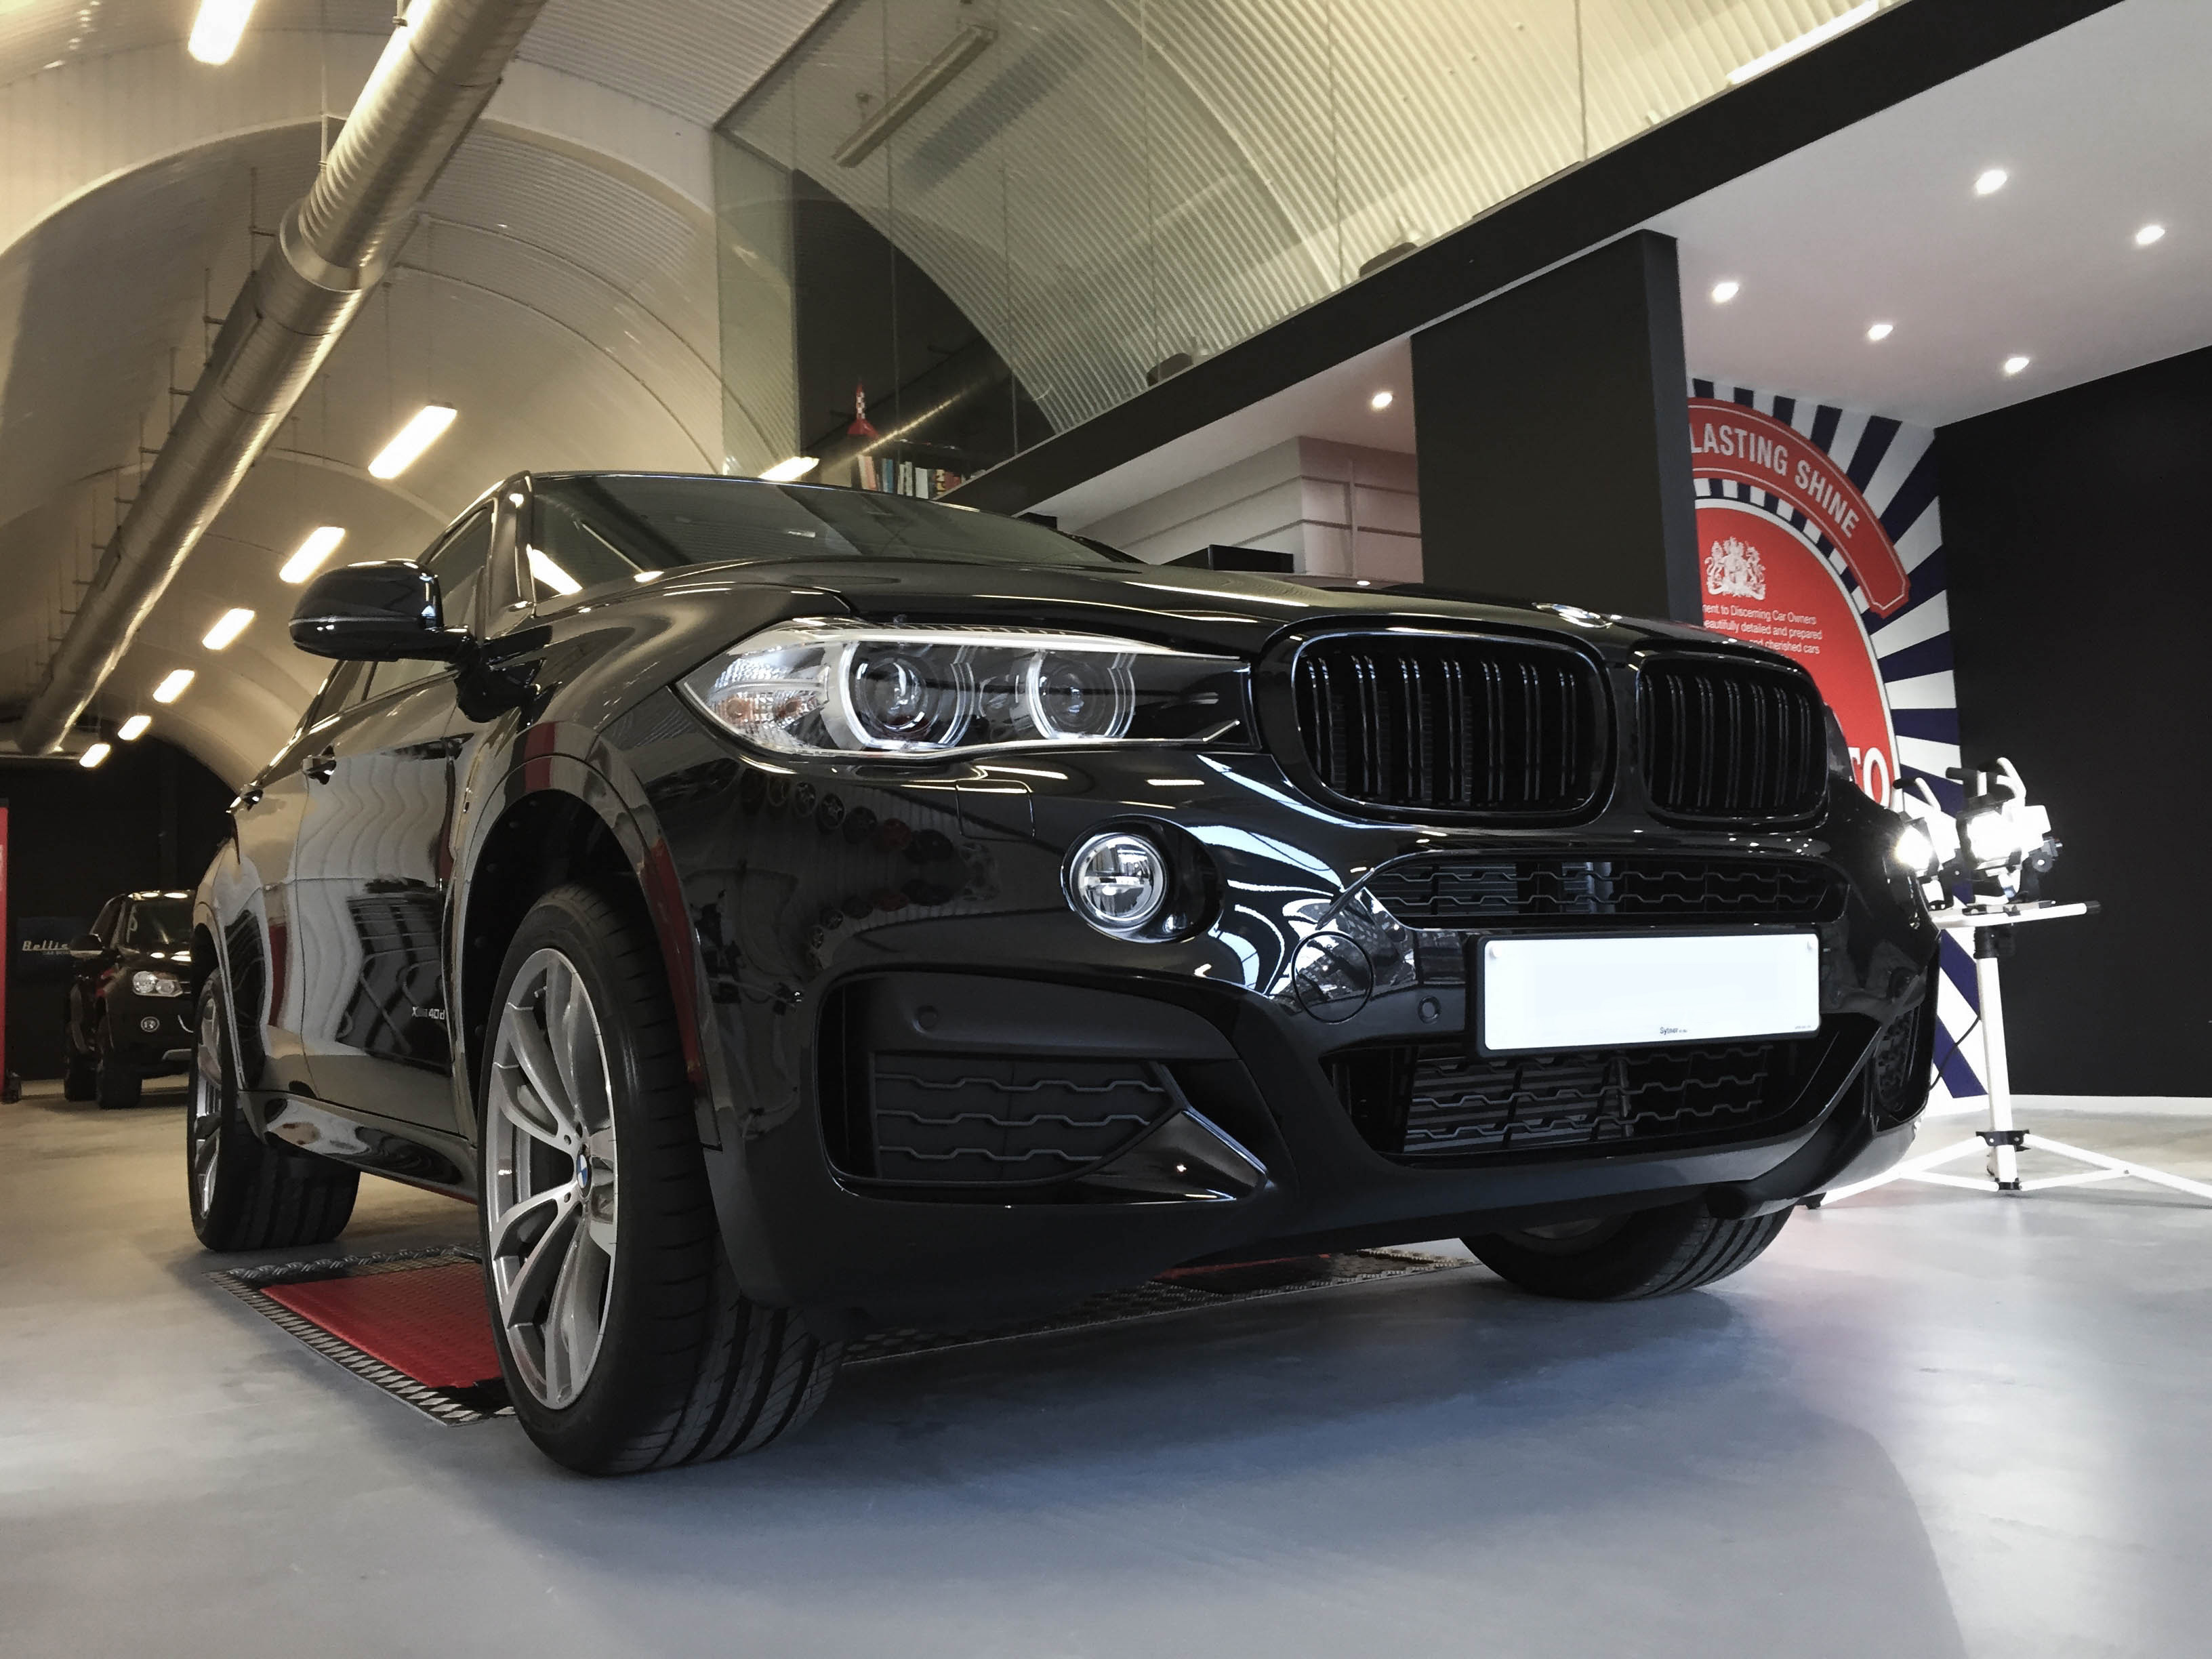 BMW X6 –Front